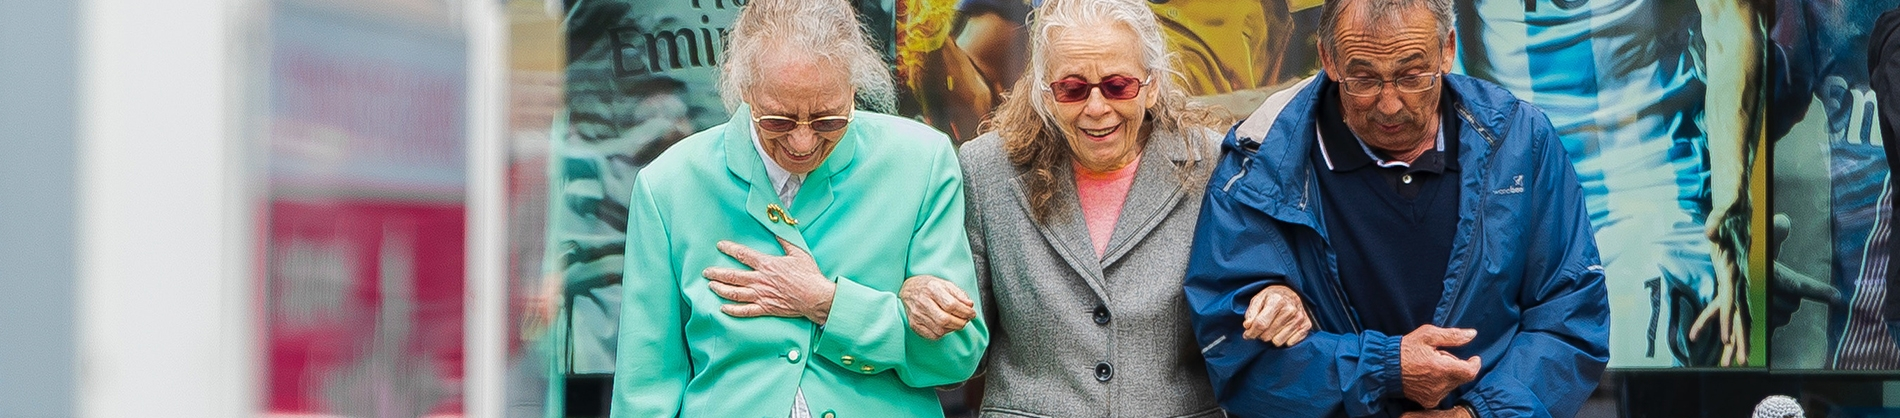 Three elderly friends walking arm in arm